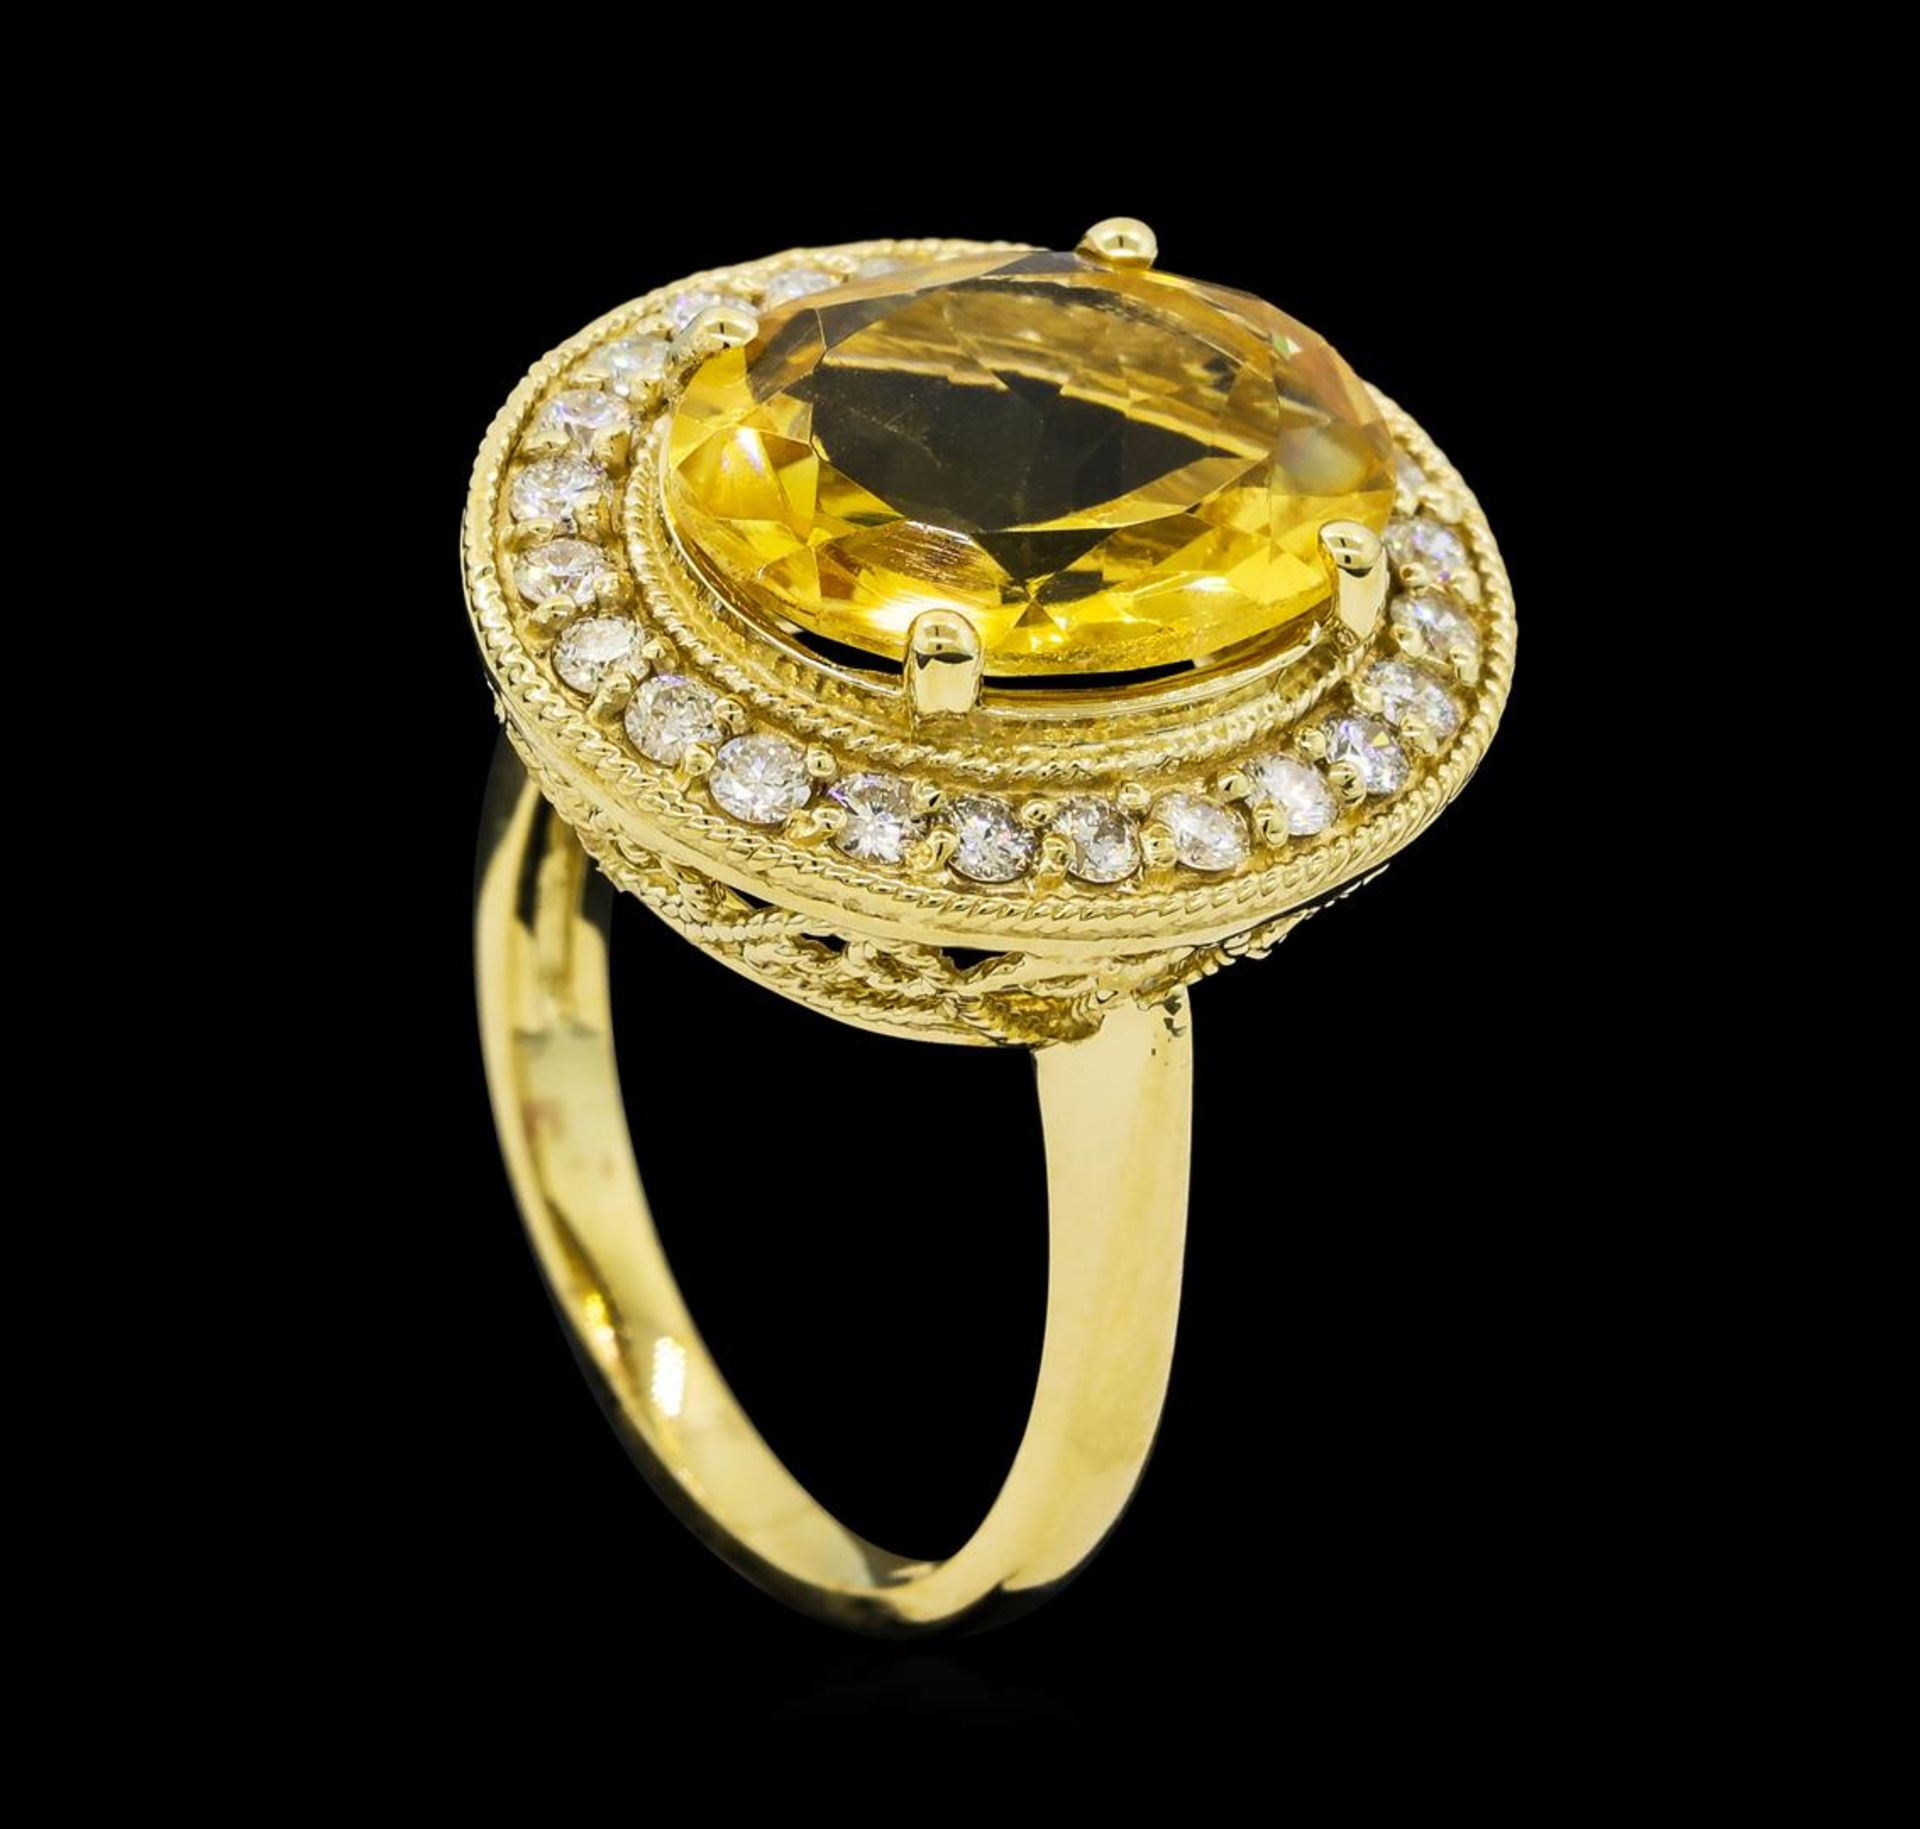 4.22 ctw Citrine Quartz and Diamond Ring - 14KT Yellow Gold - Image 4 of 4